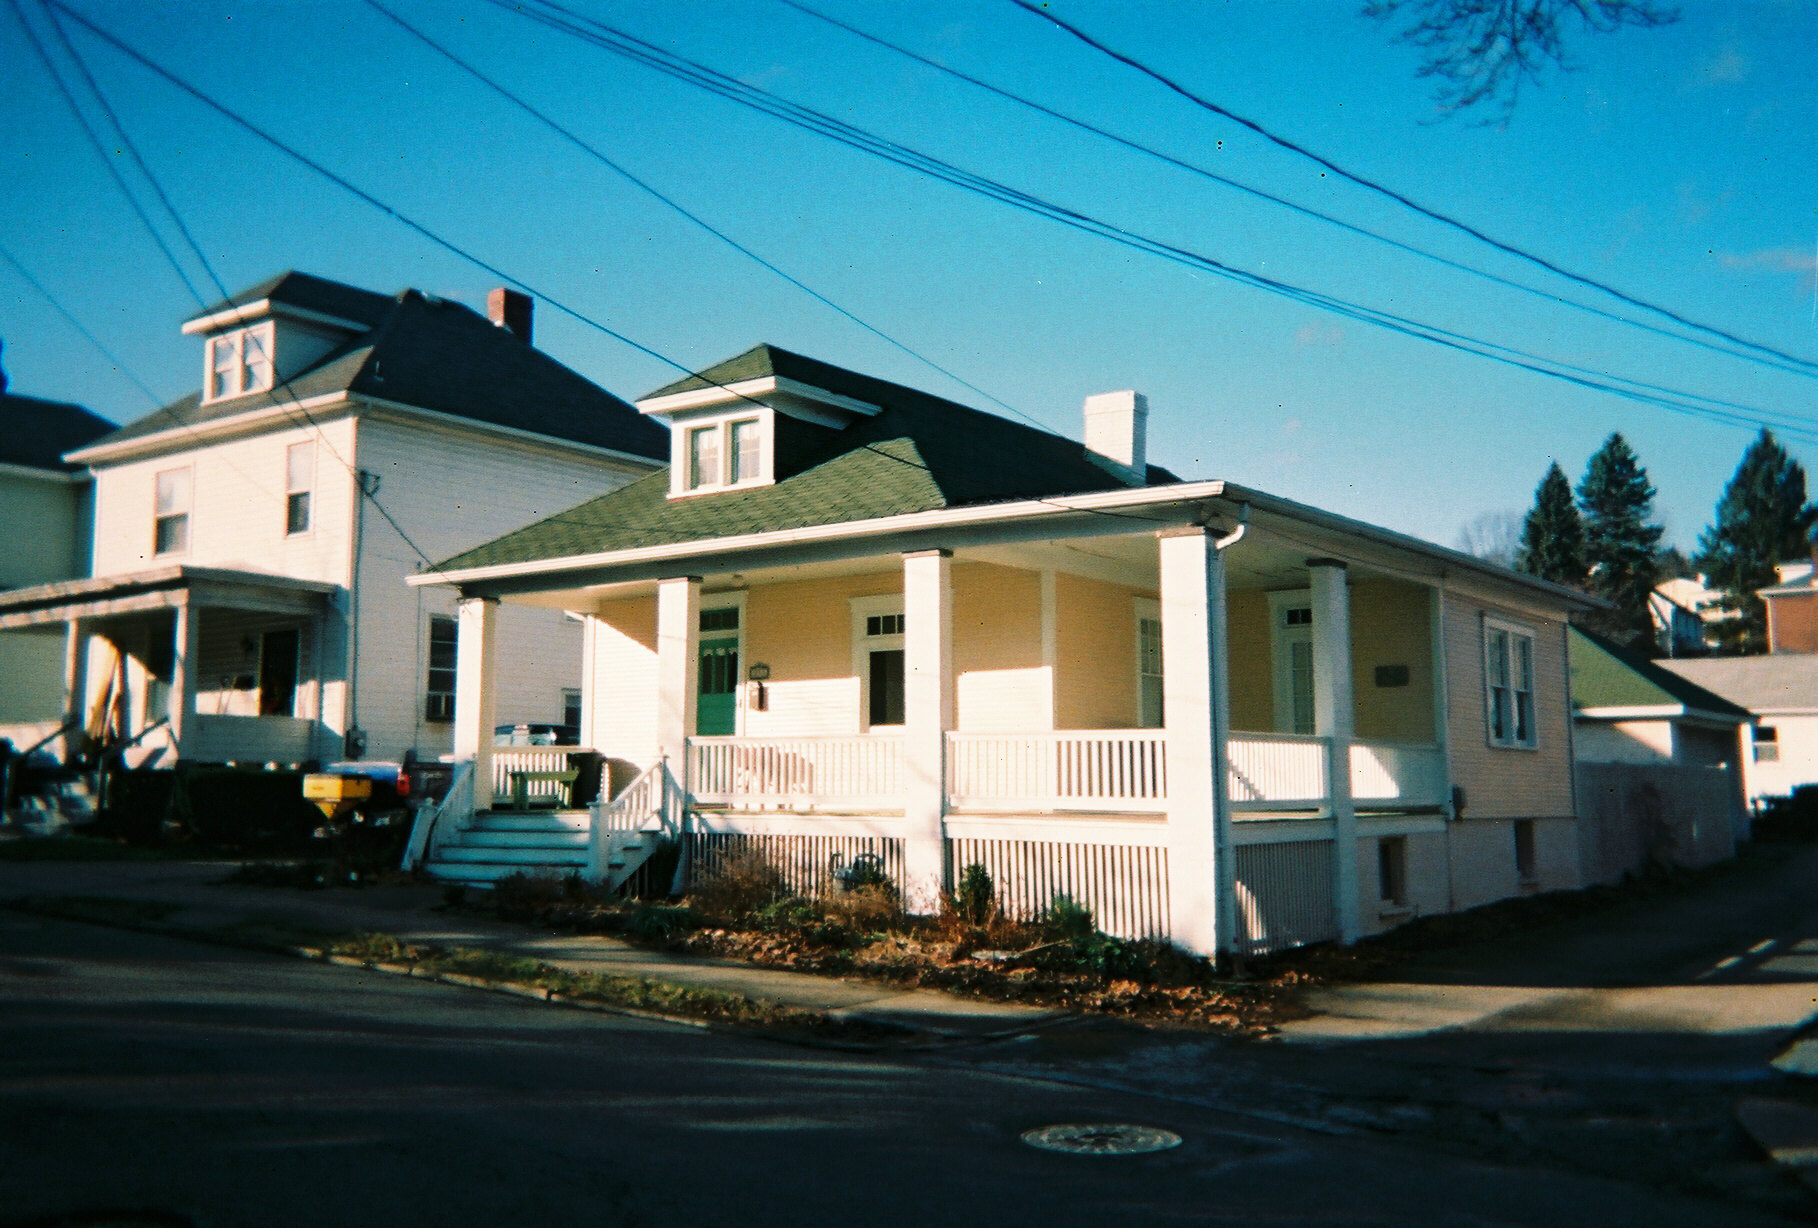 https://upload.wikimedia.org/wikipedia/commons/f/f9/Sears_Catalog_Home_Greensburg_Pennsylvania.jpg